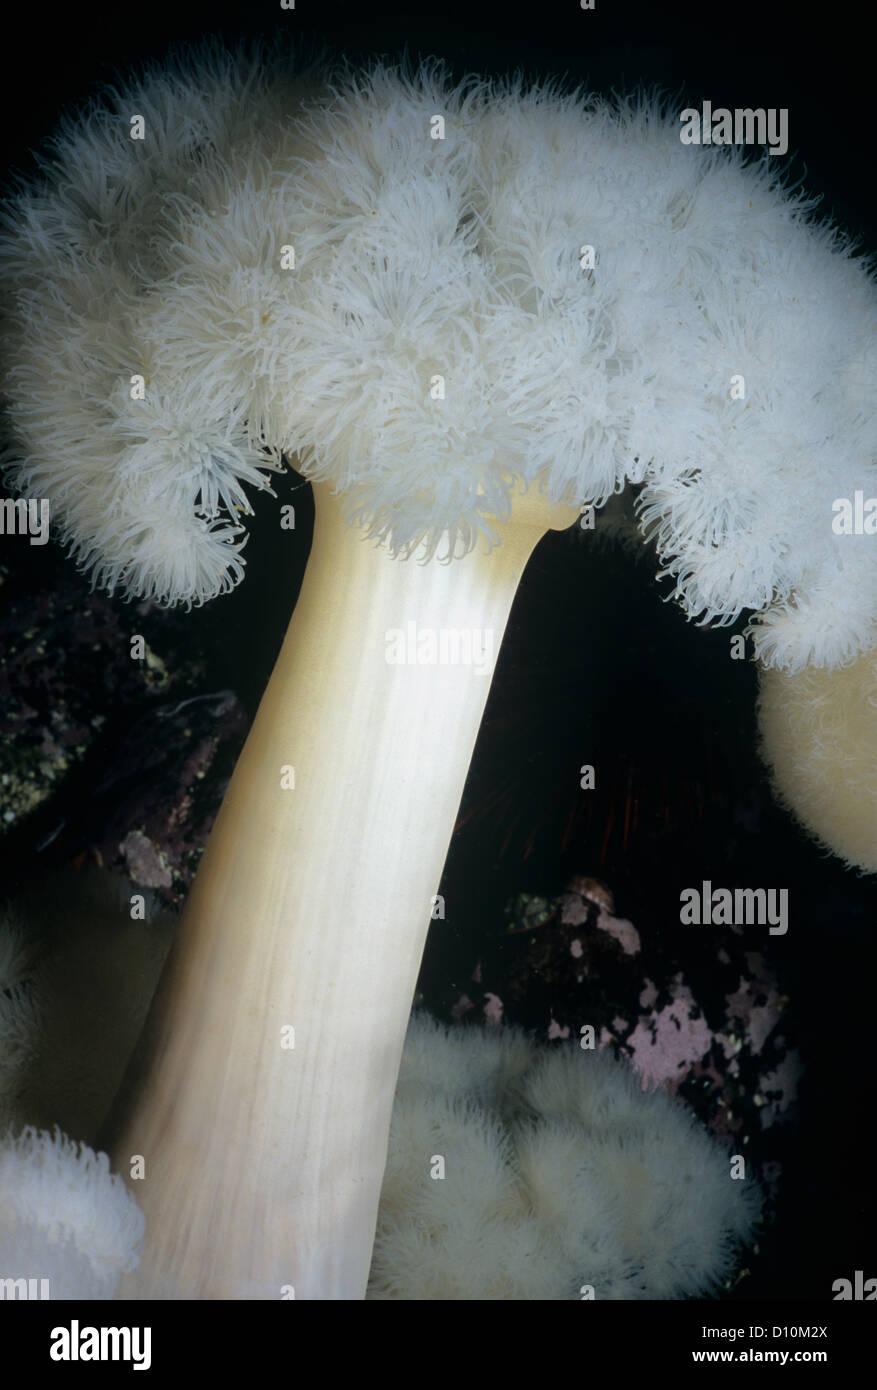 Close-up of White-Plumed Anemone (Metridium farcimen). Queen Charlotte Strait, British Columbia, Canada, North Pacific - Stock Image